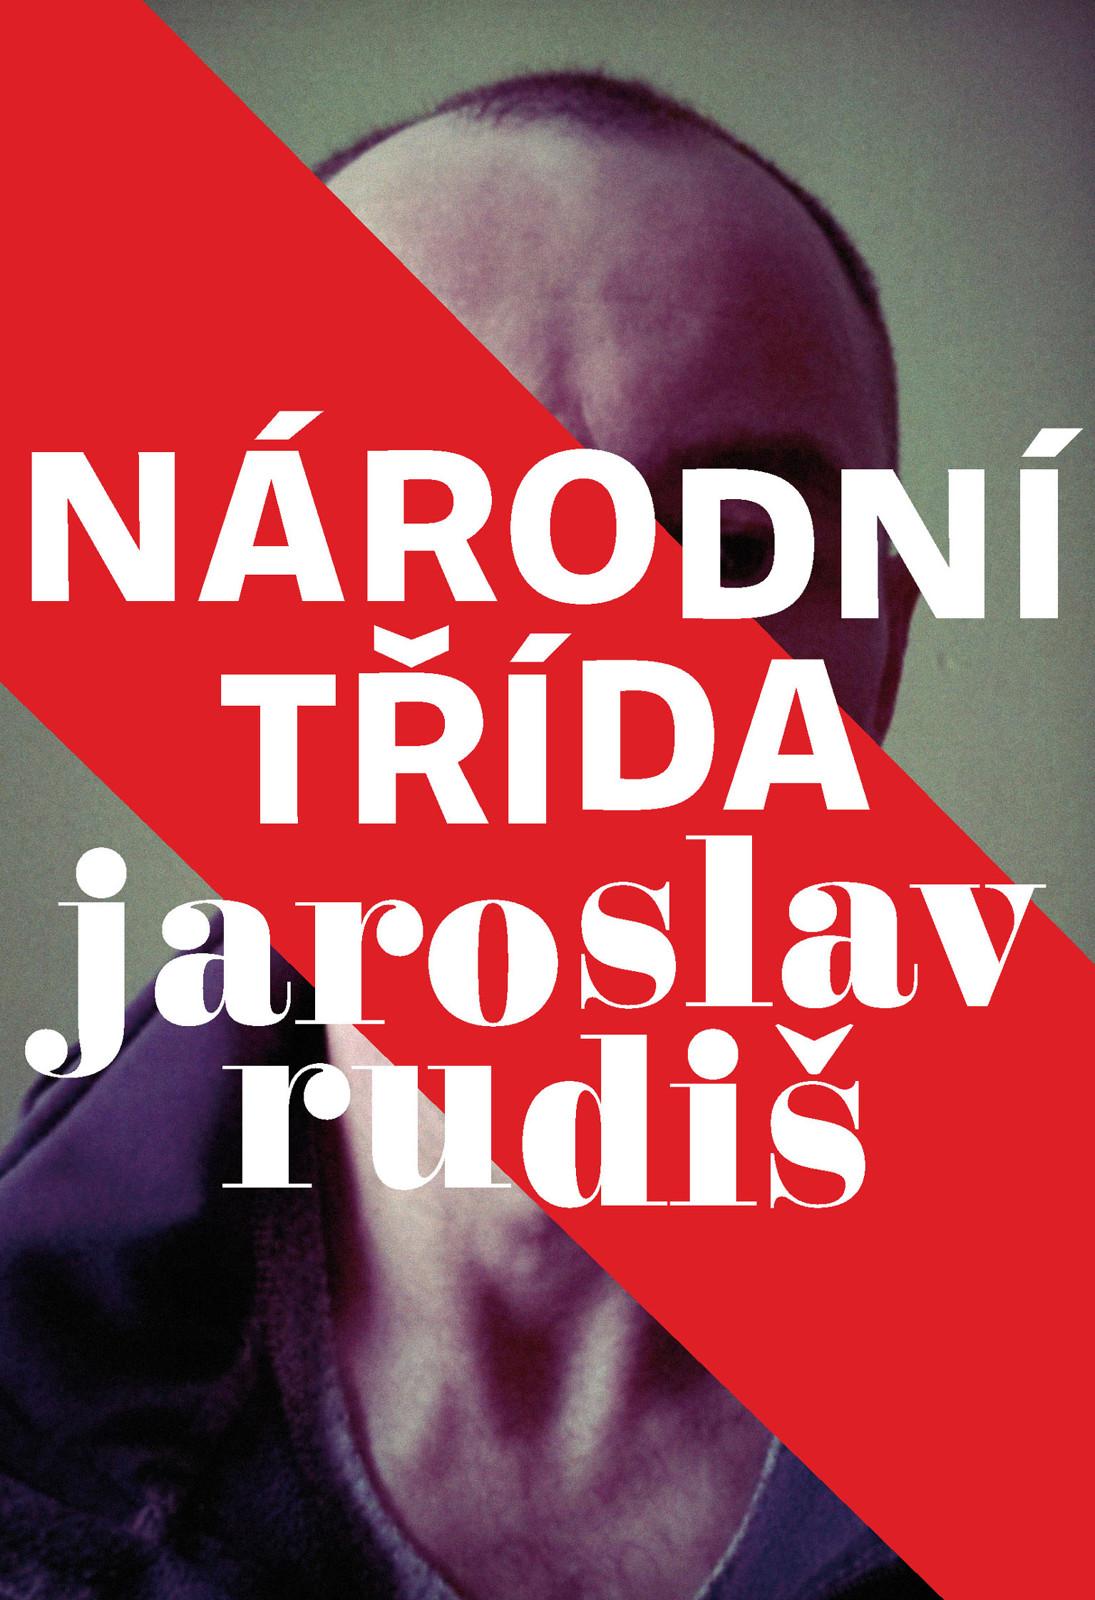 media/covers/0/a/a9/Narodni-trida.jpg